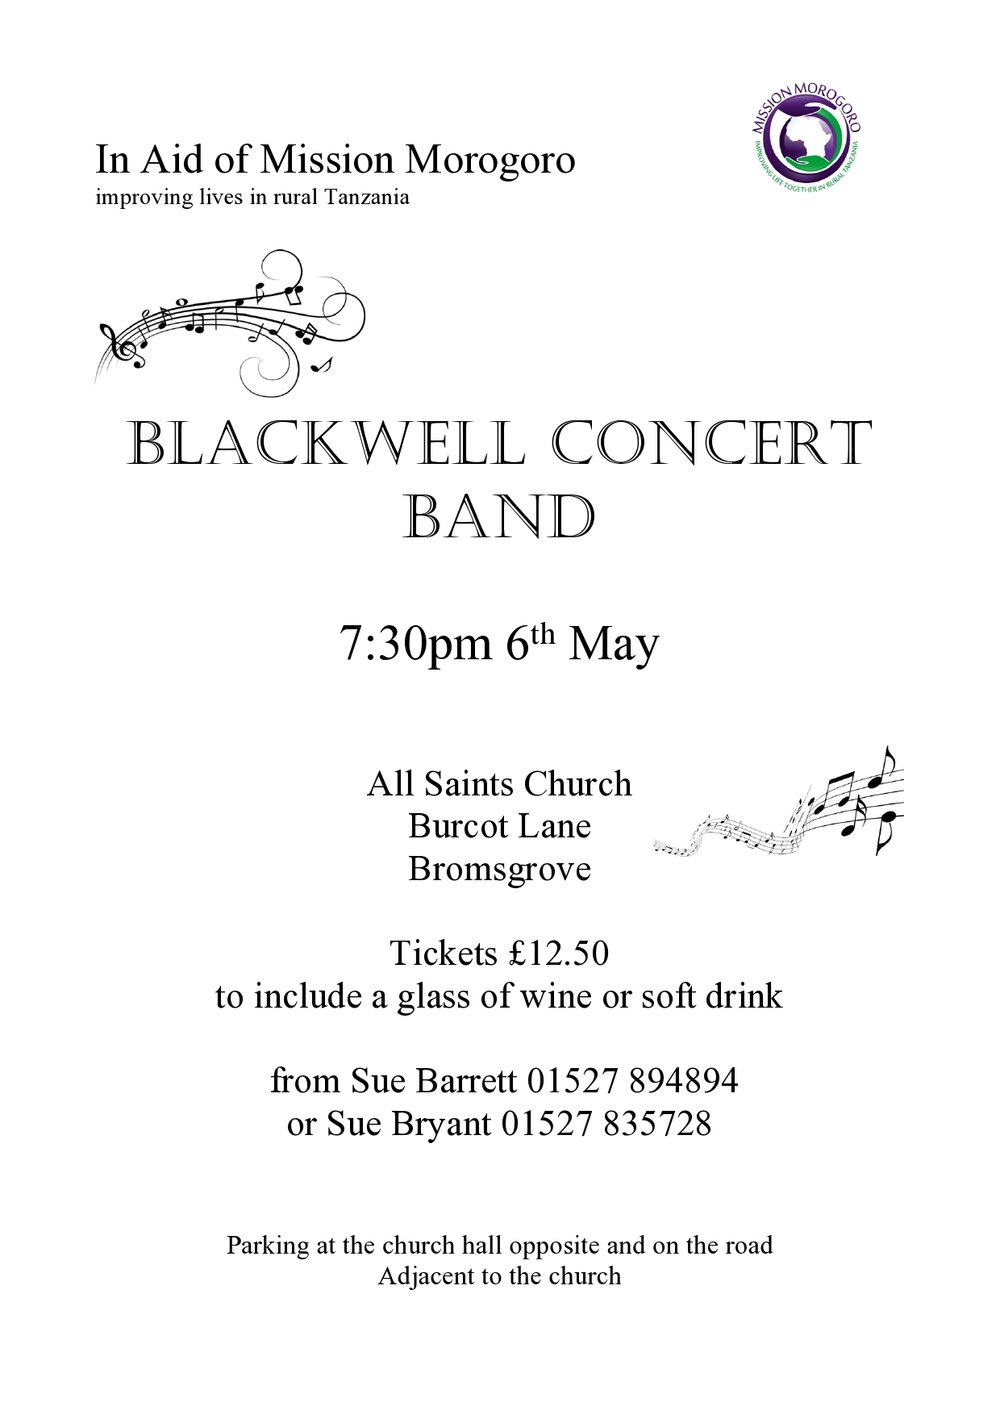 Blackwell Concert Band — MISSION MOROGORO